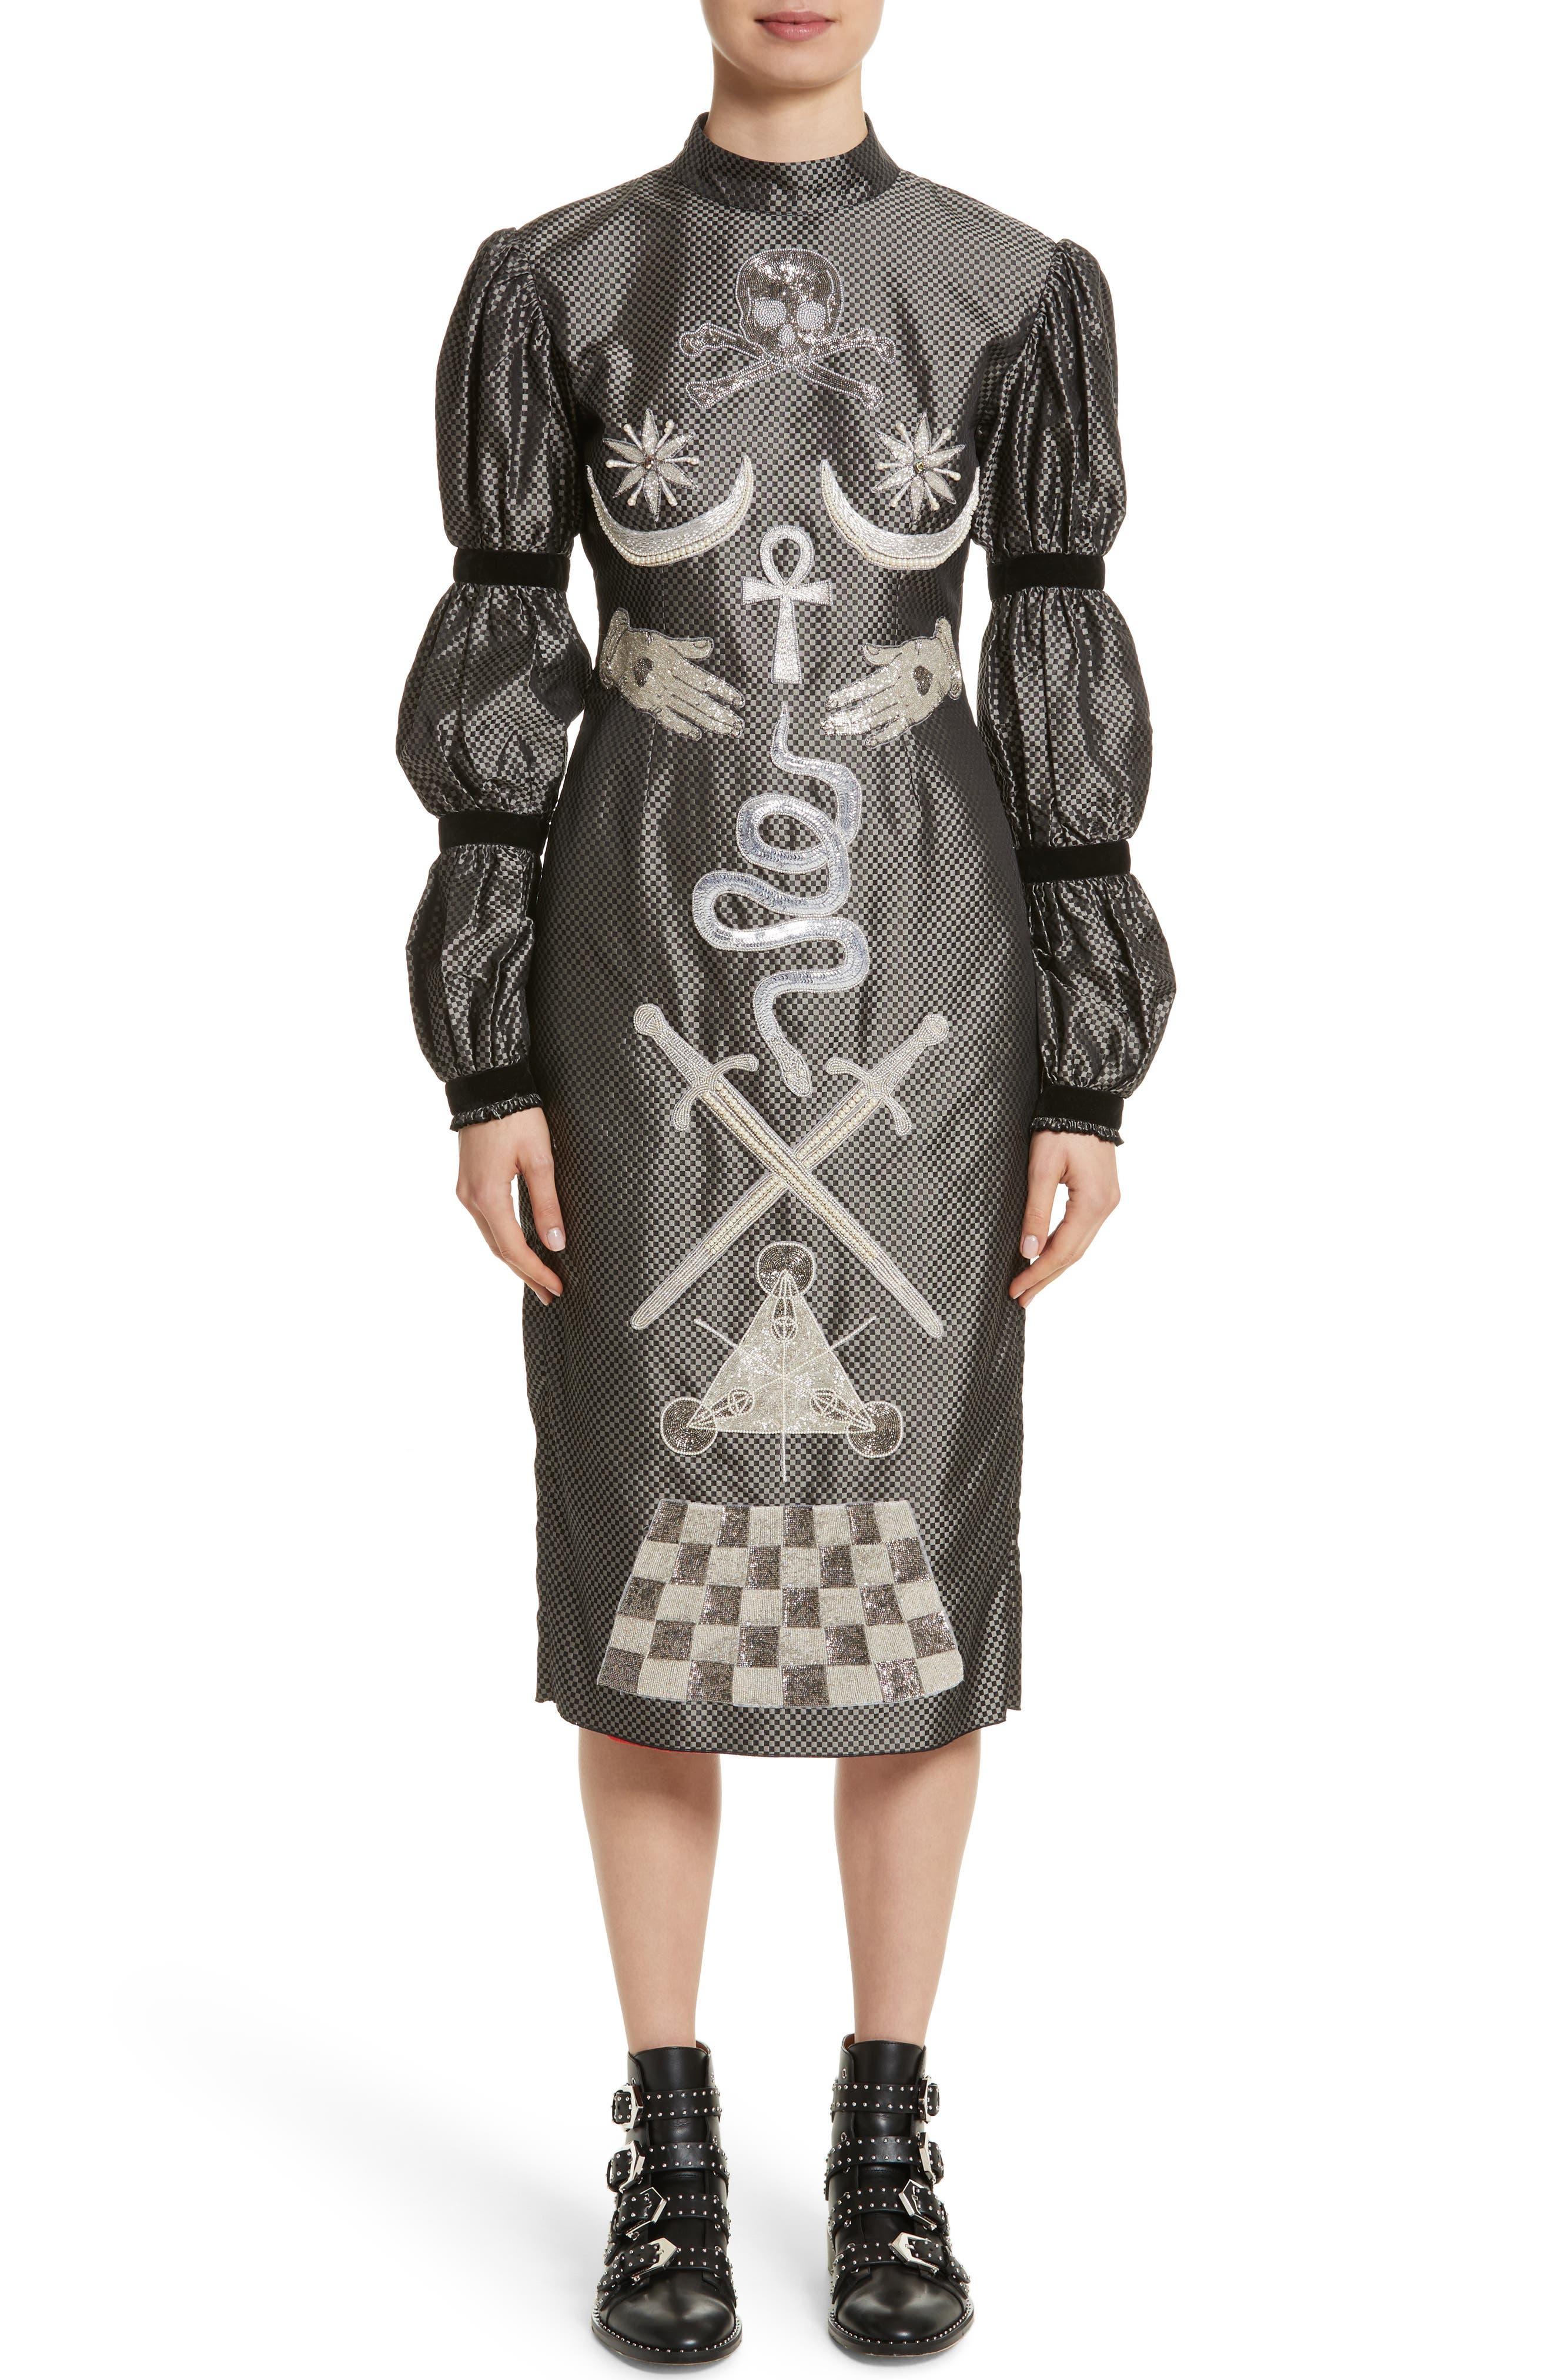 Alternate Image 1 Selected - Dilara Findikoglu Alien Goddess Embellished Silk Dress